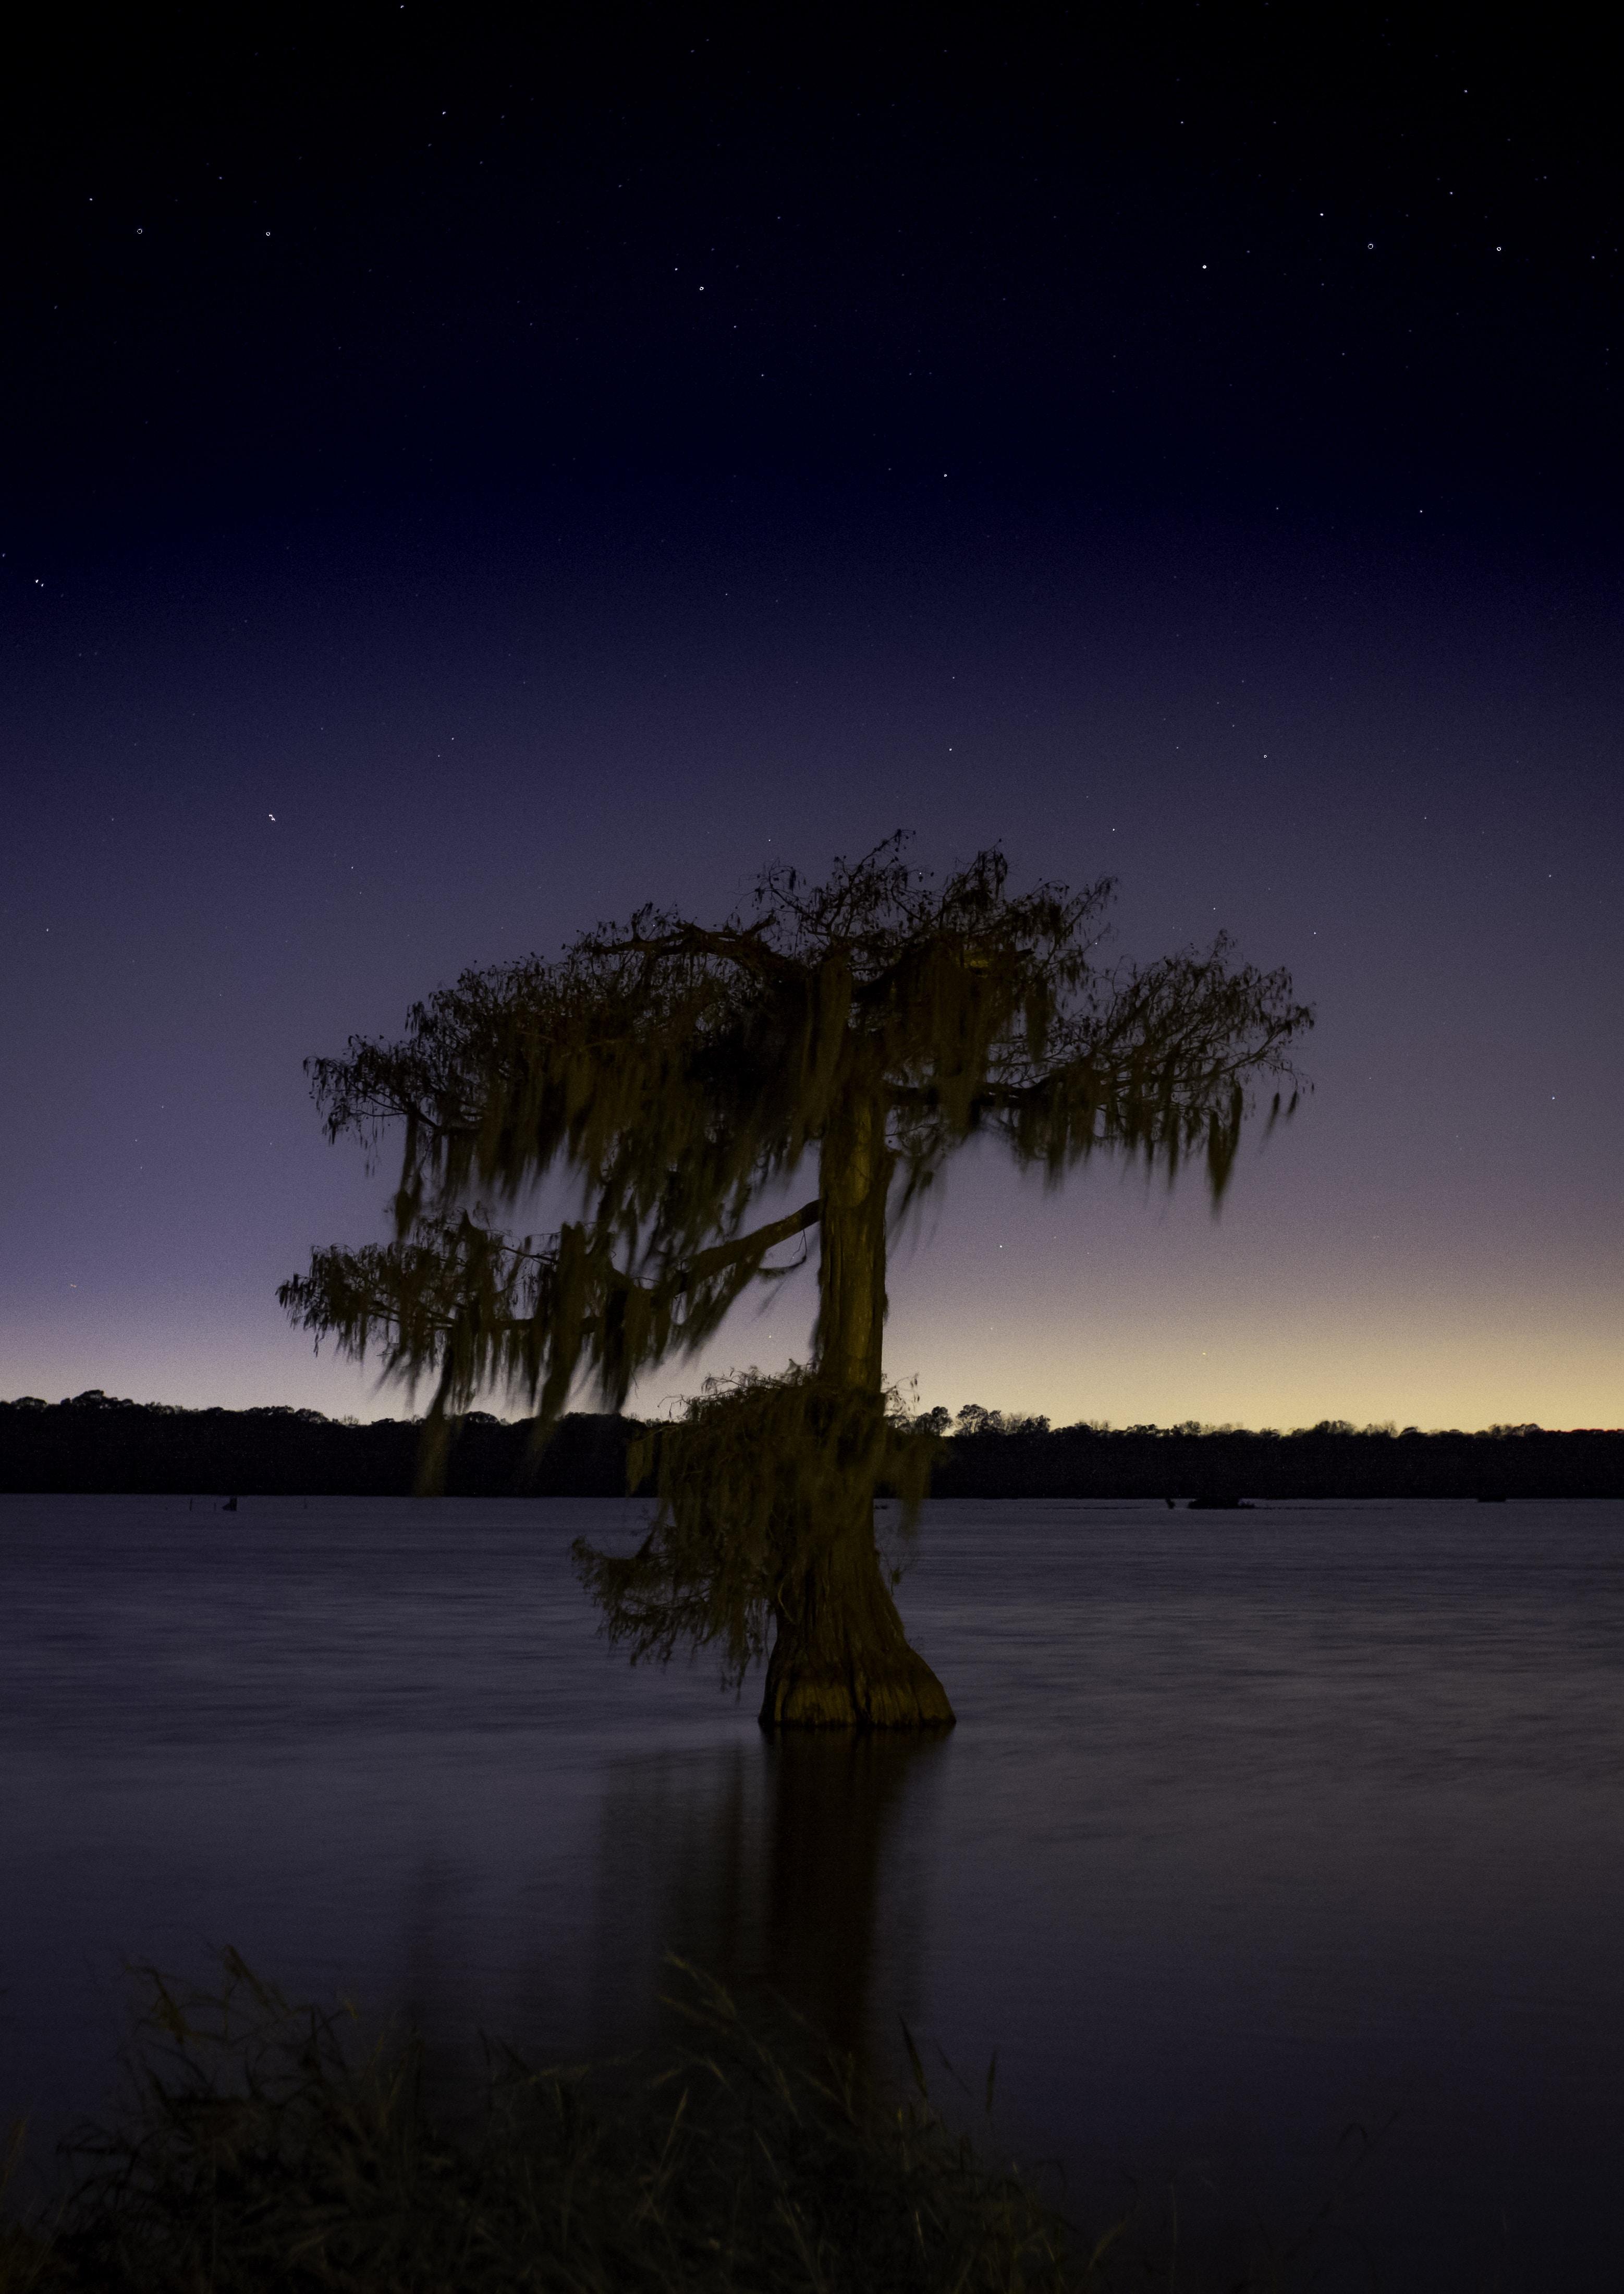 brown tree surrounded ocean water under night sky